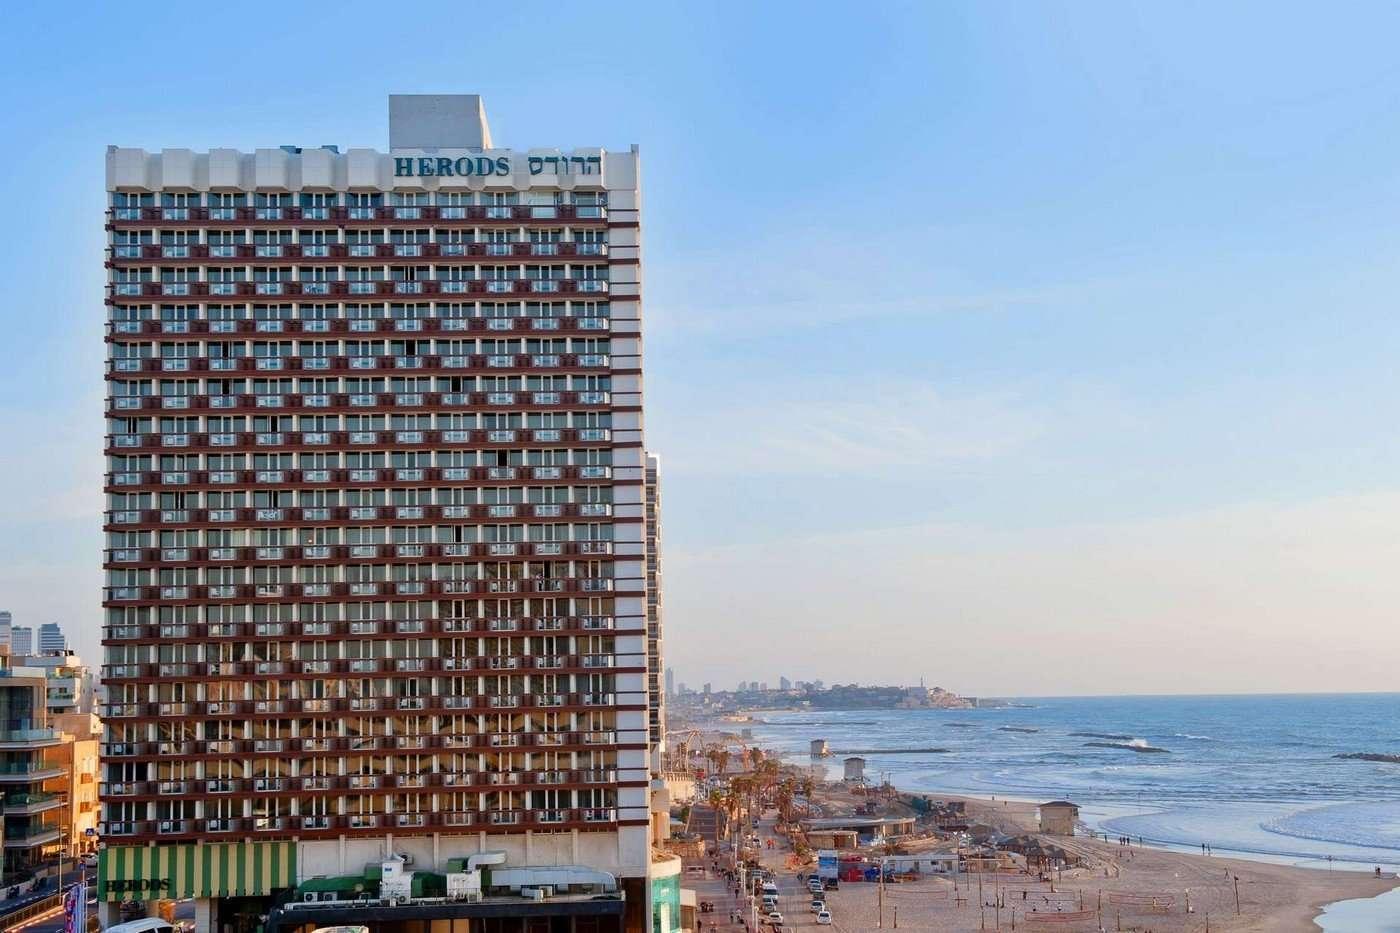 Herods Tel Aviv Hotel - A Luxury Hotel In Tel Aviv